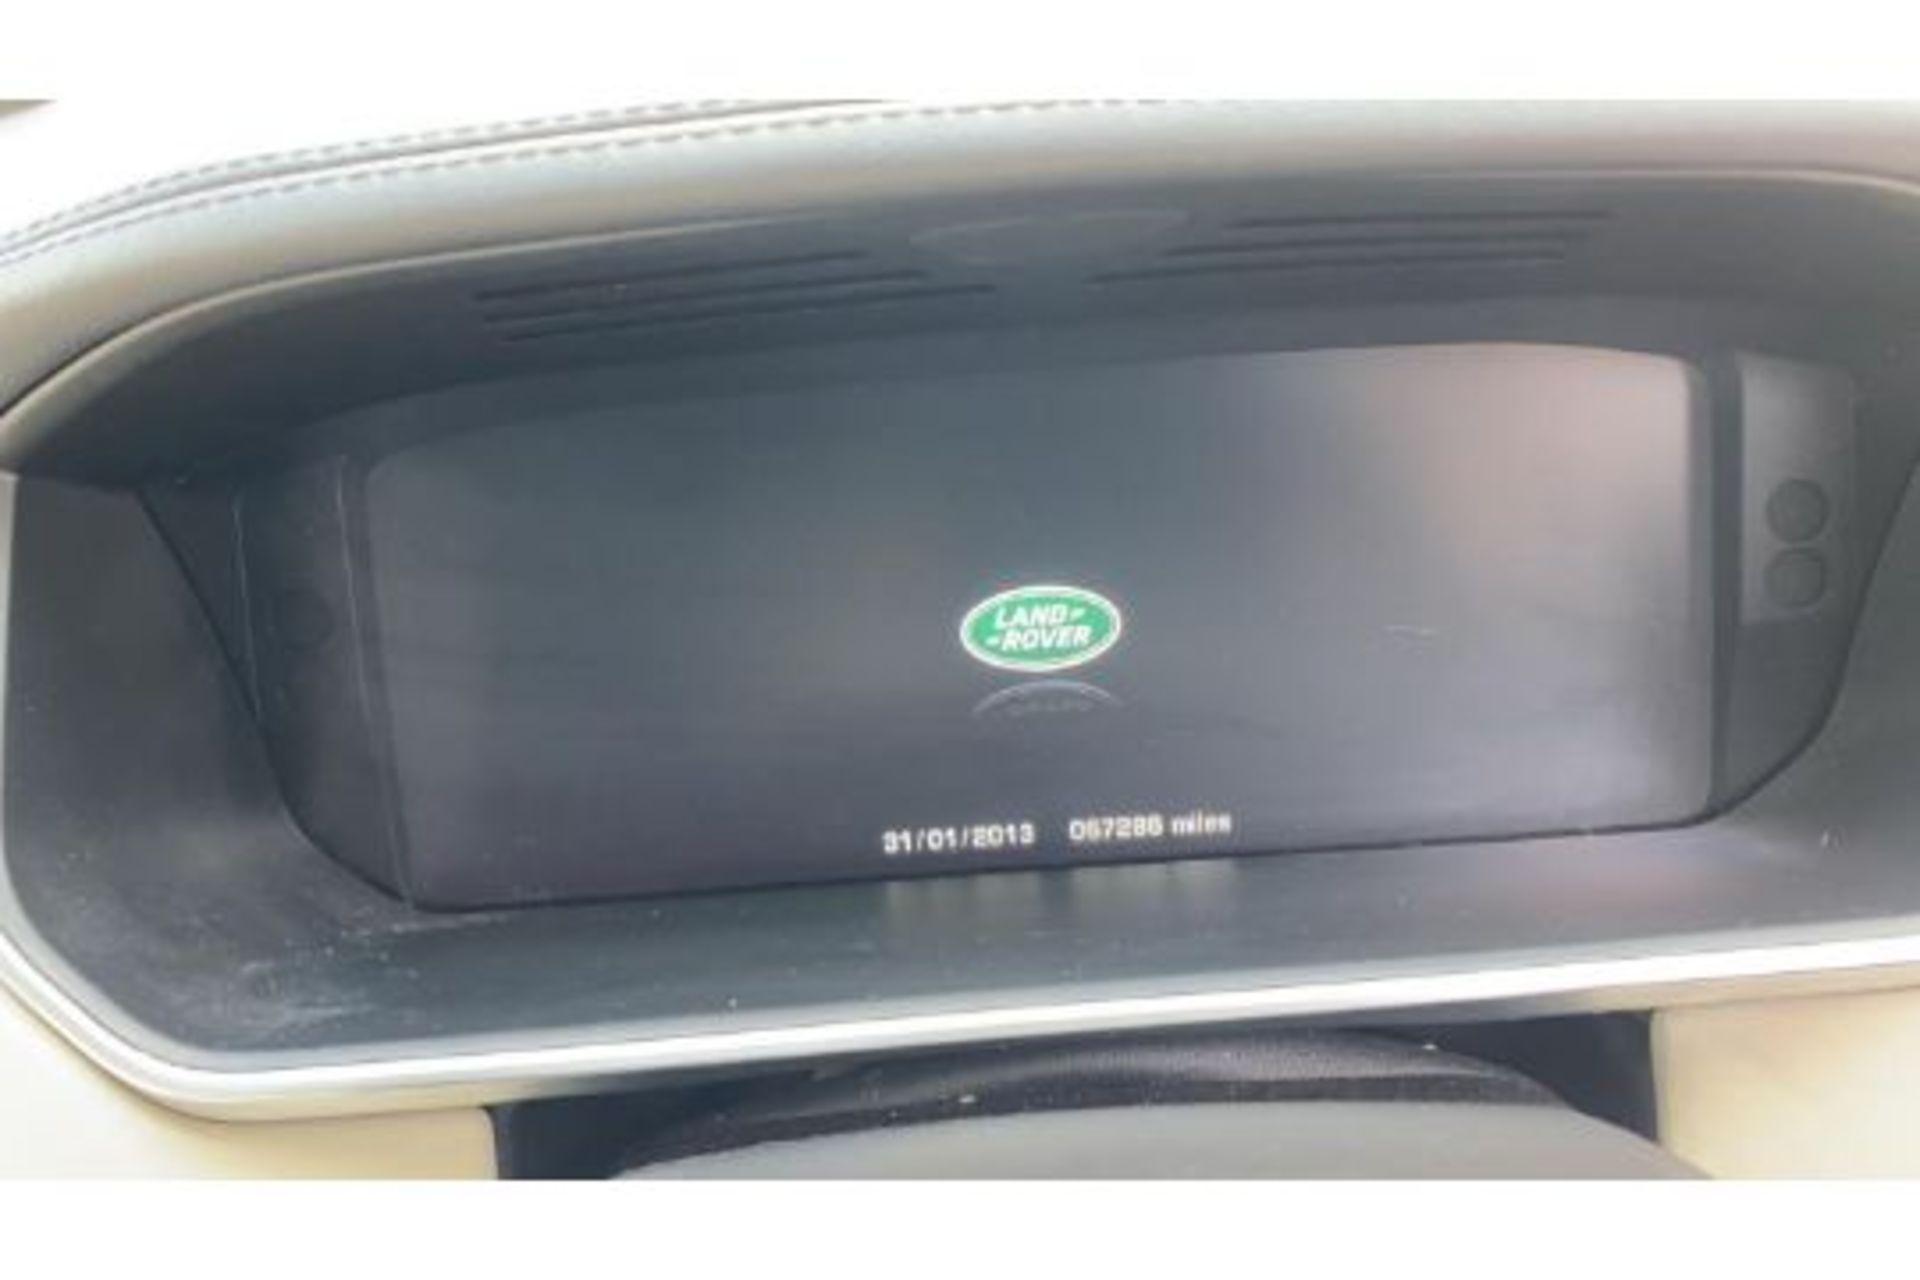 Range Rover Vogue 3.0 TDV6 SE Auto - Black Pack - NEW SHAPE - FULLY LOADED - Pan Roof - Image 23 of 30